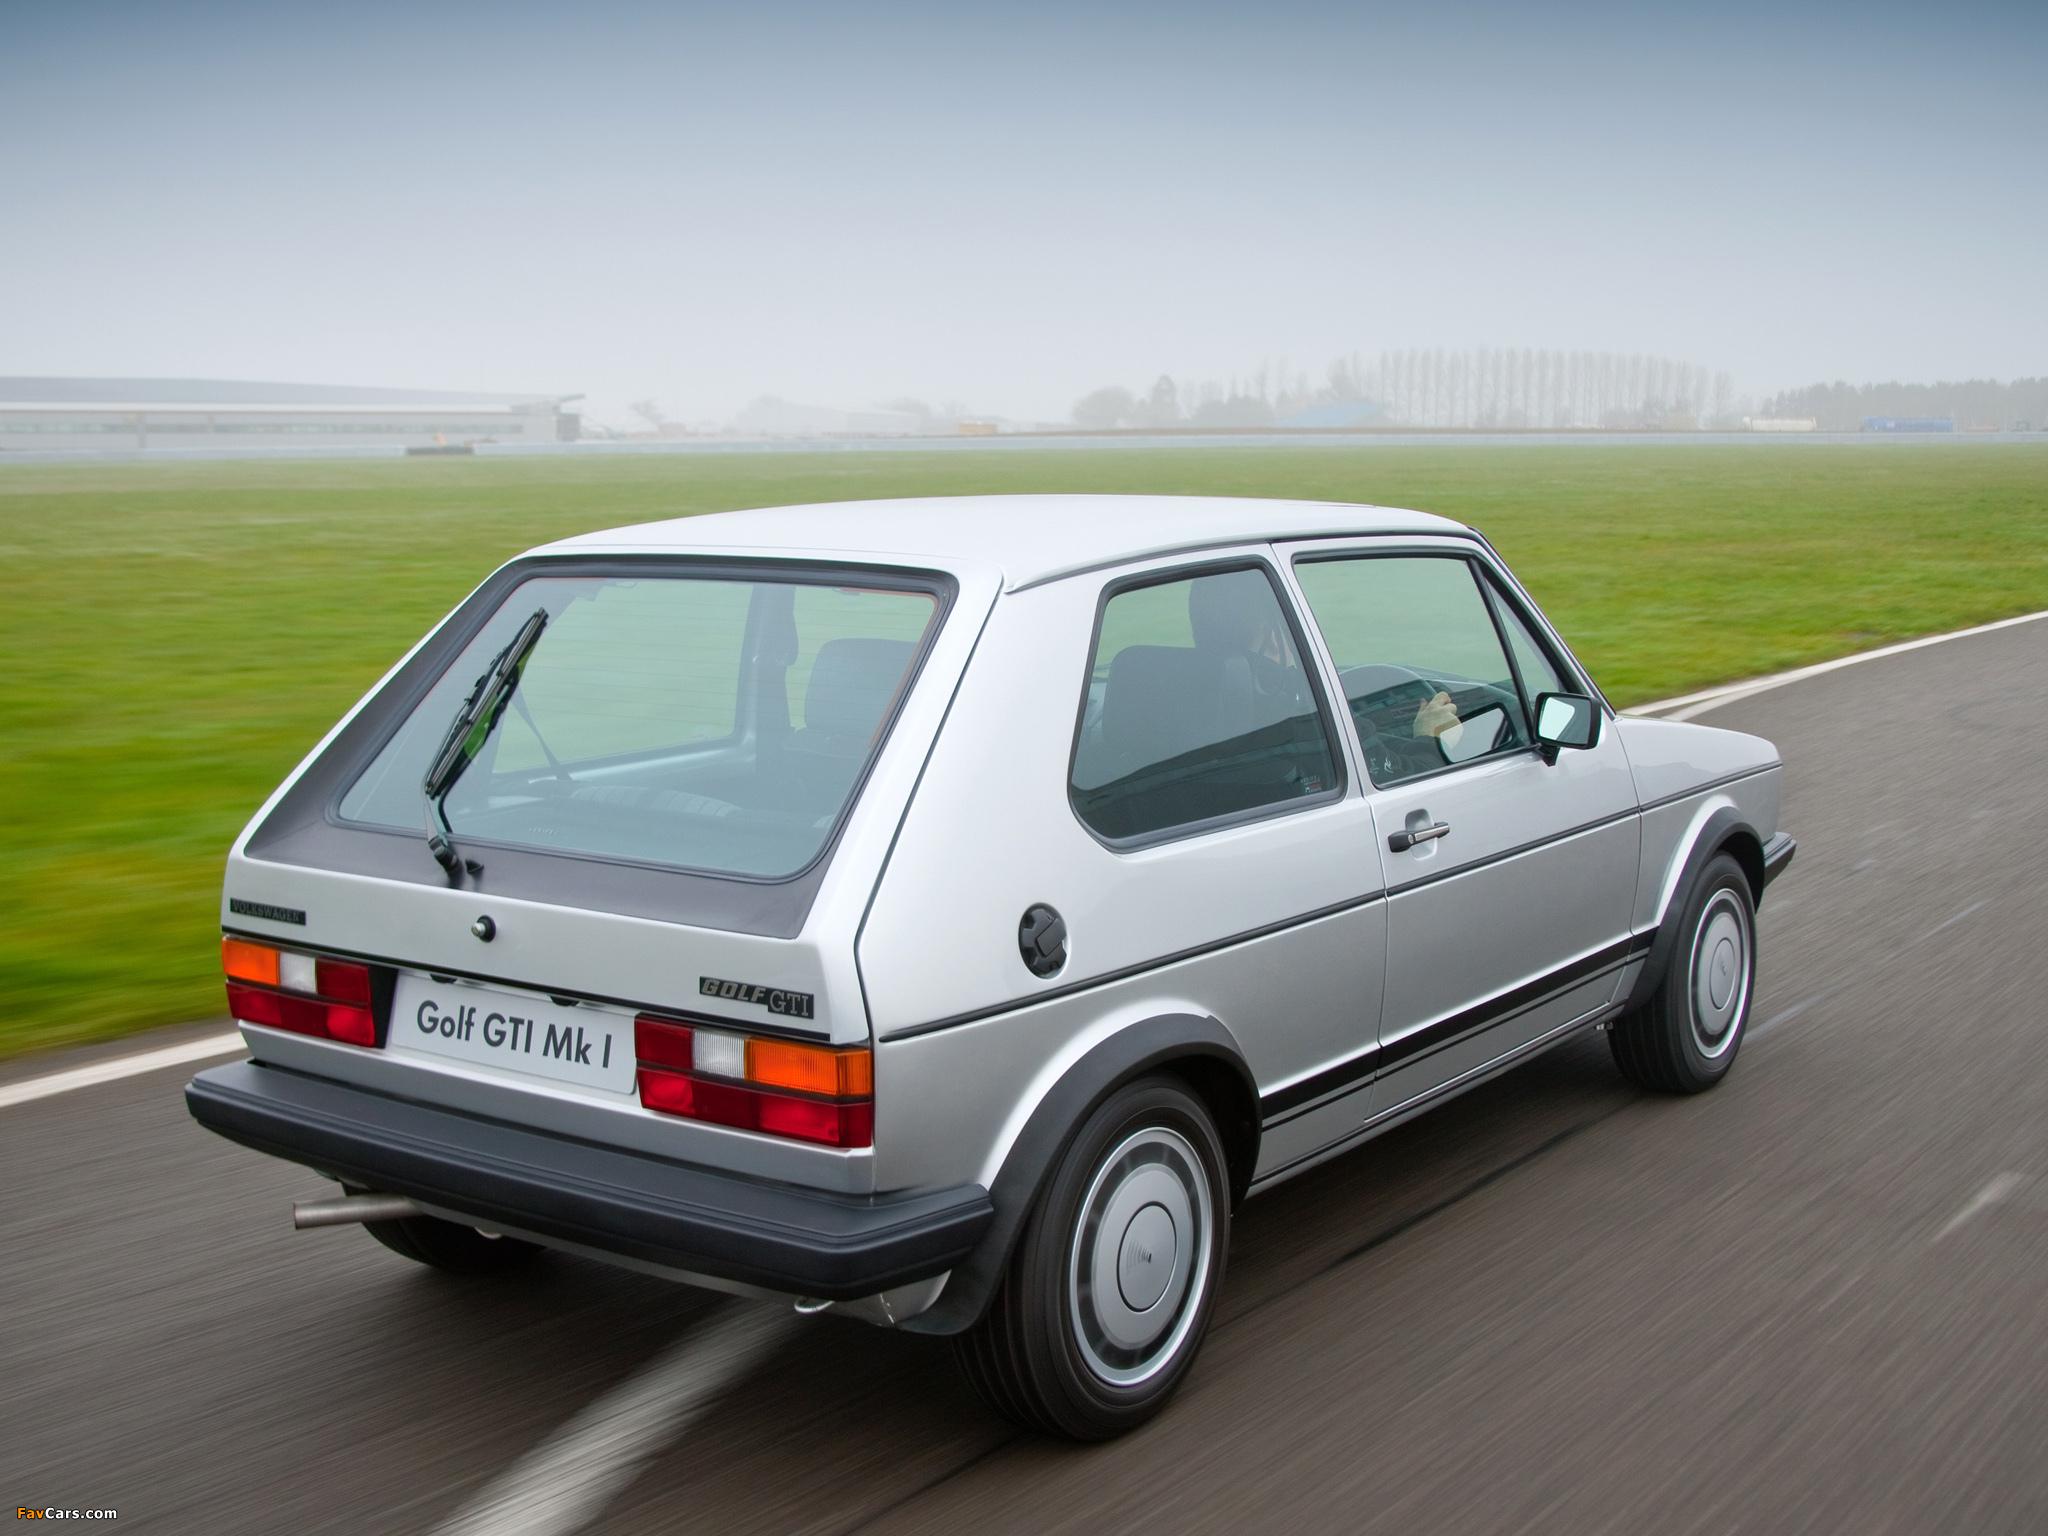 511791945126997633 likewise Showthread as well Index besides Ferrari Red 1990 Volkswagen Cabriolet  plete Restoration besides 1985 Volkswagen GTI Pictures C7108. on 1987 vw rabbit